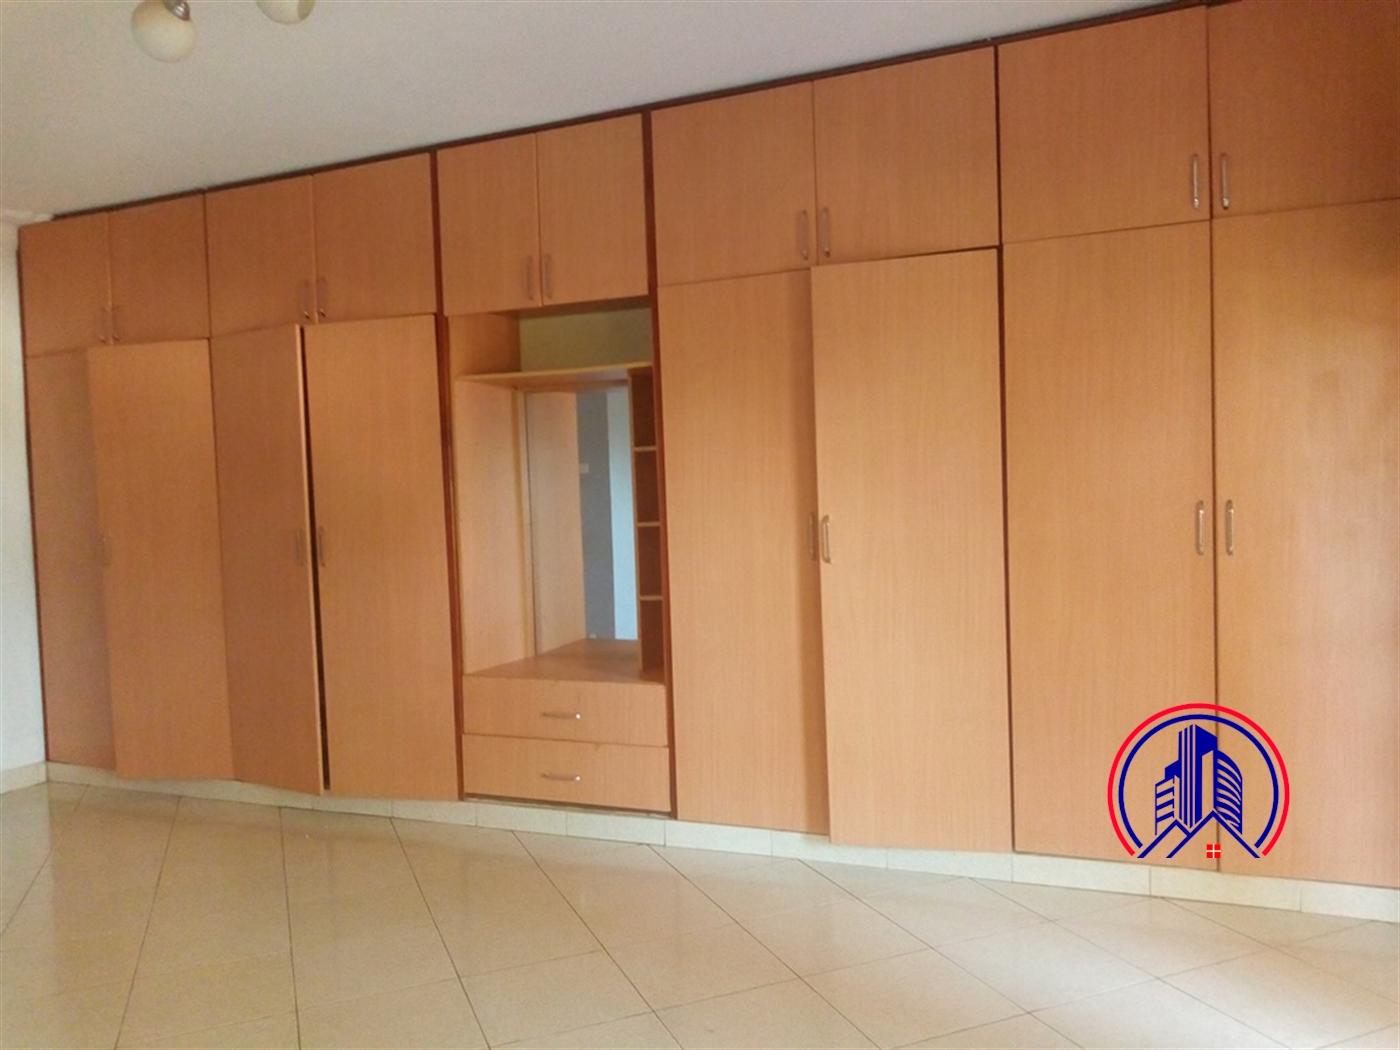 Bungalow for rent in Kasanga Kampala